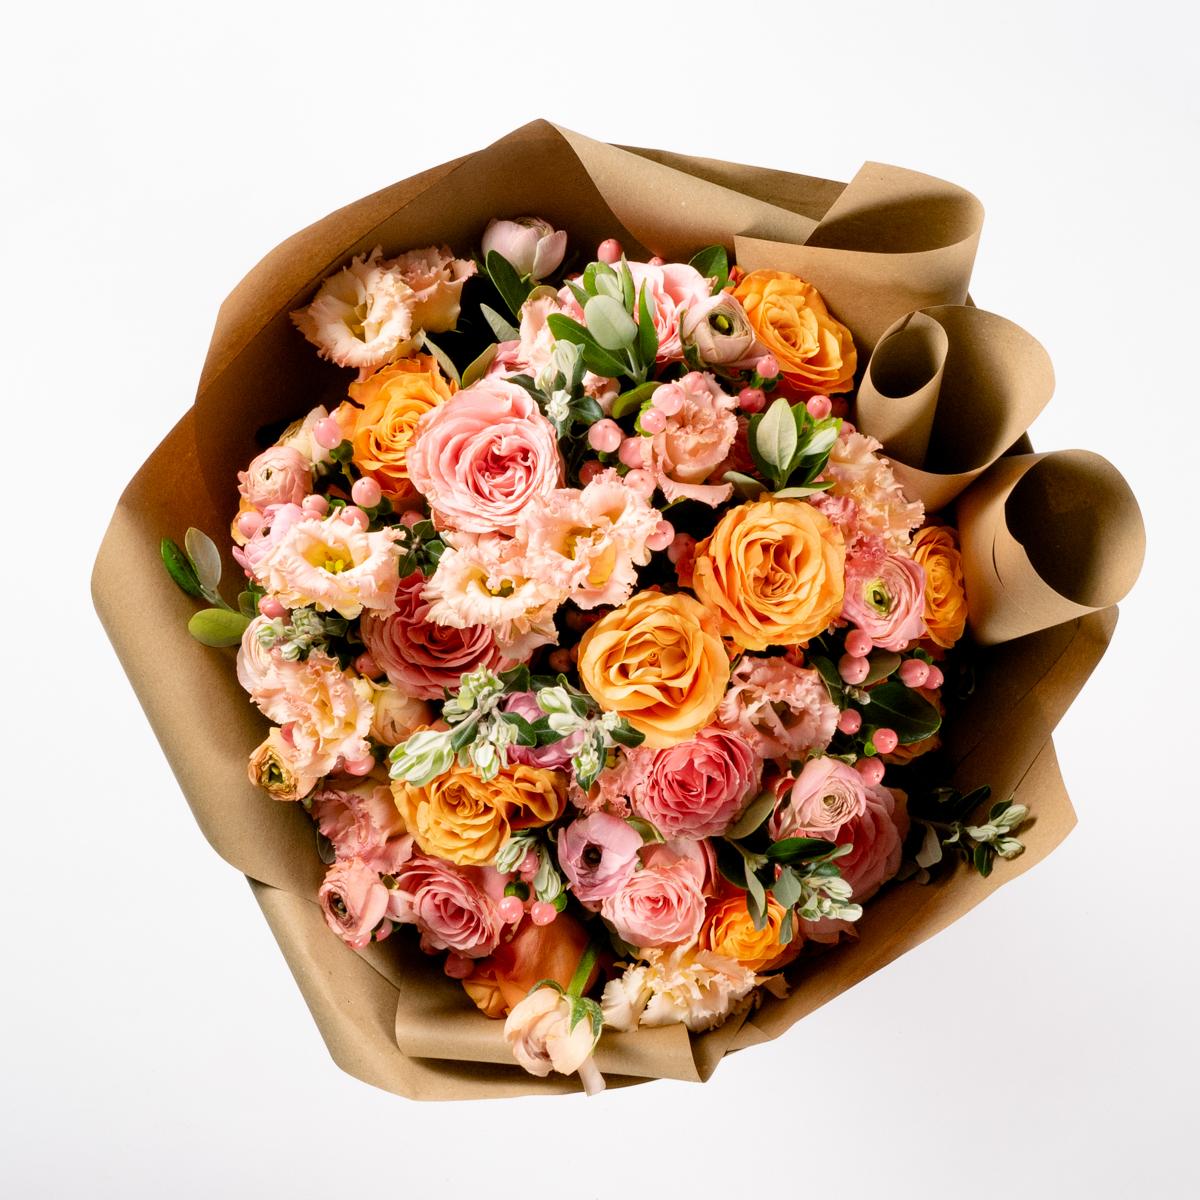 Bloom Flower Delivery | Pembroke Bouquet